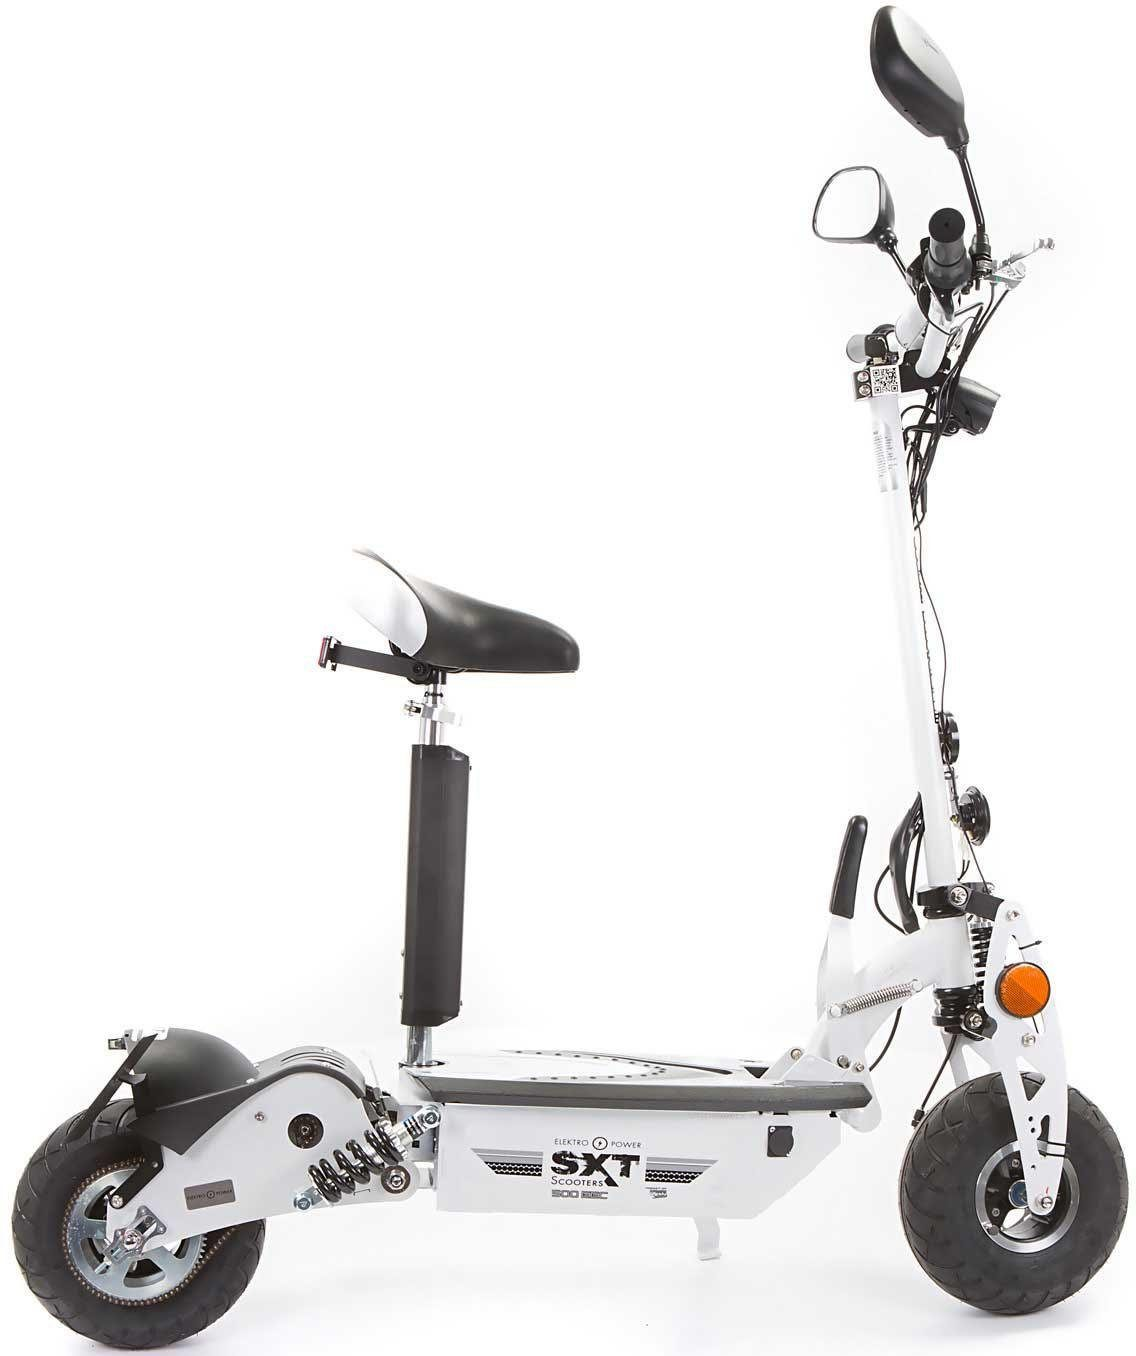 SXT Scooters Elektroscooter, 500 Watt, 20 km/h, »SXT500 EEC LiIon Lithiumakku«